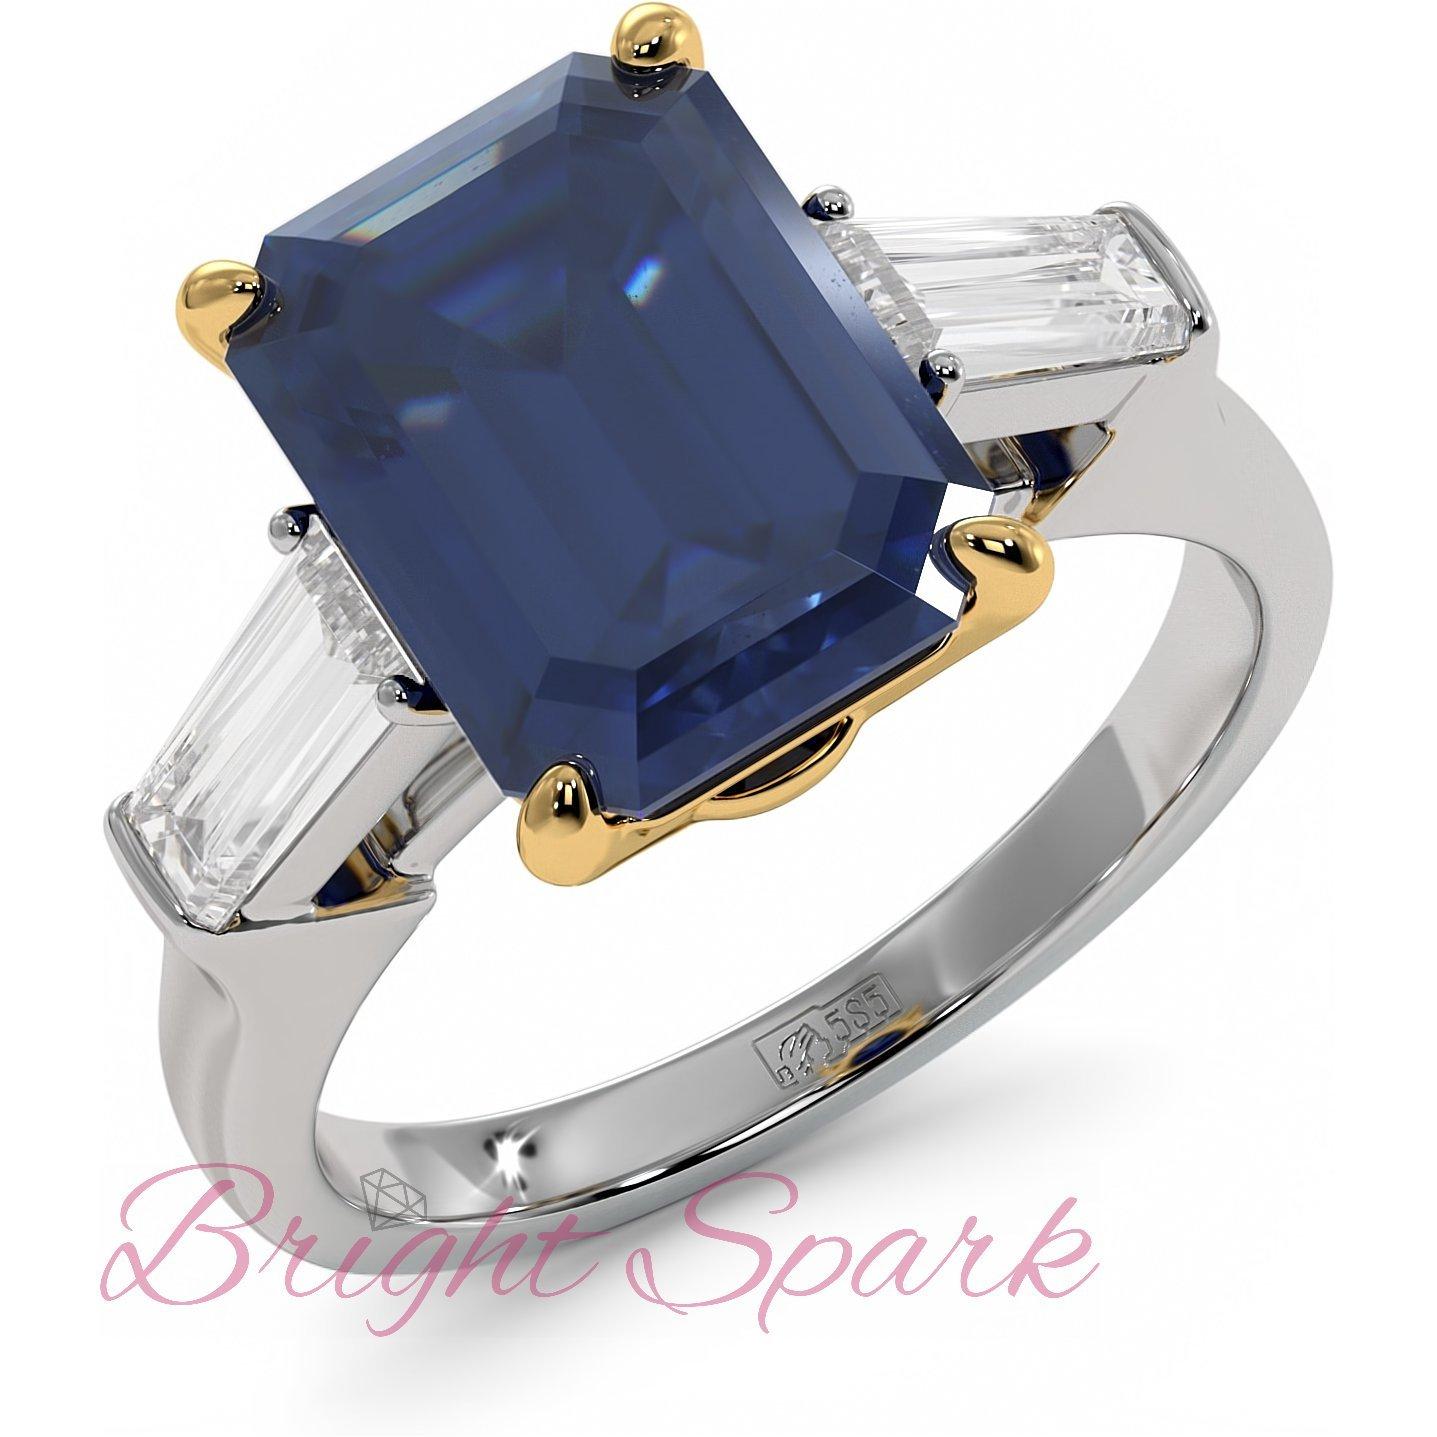 Кольцо в стиле Графф с сапфиром Nice Sapphire 6,5 карат